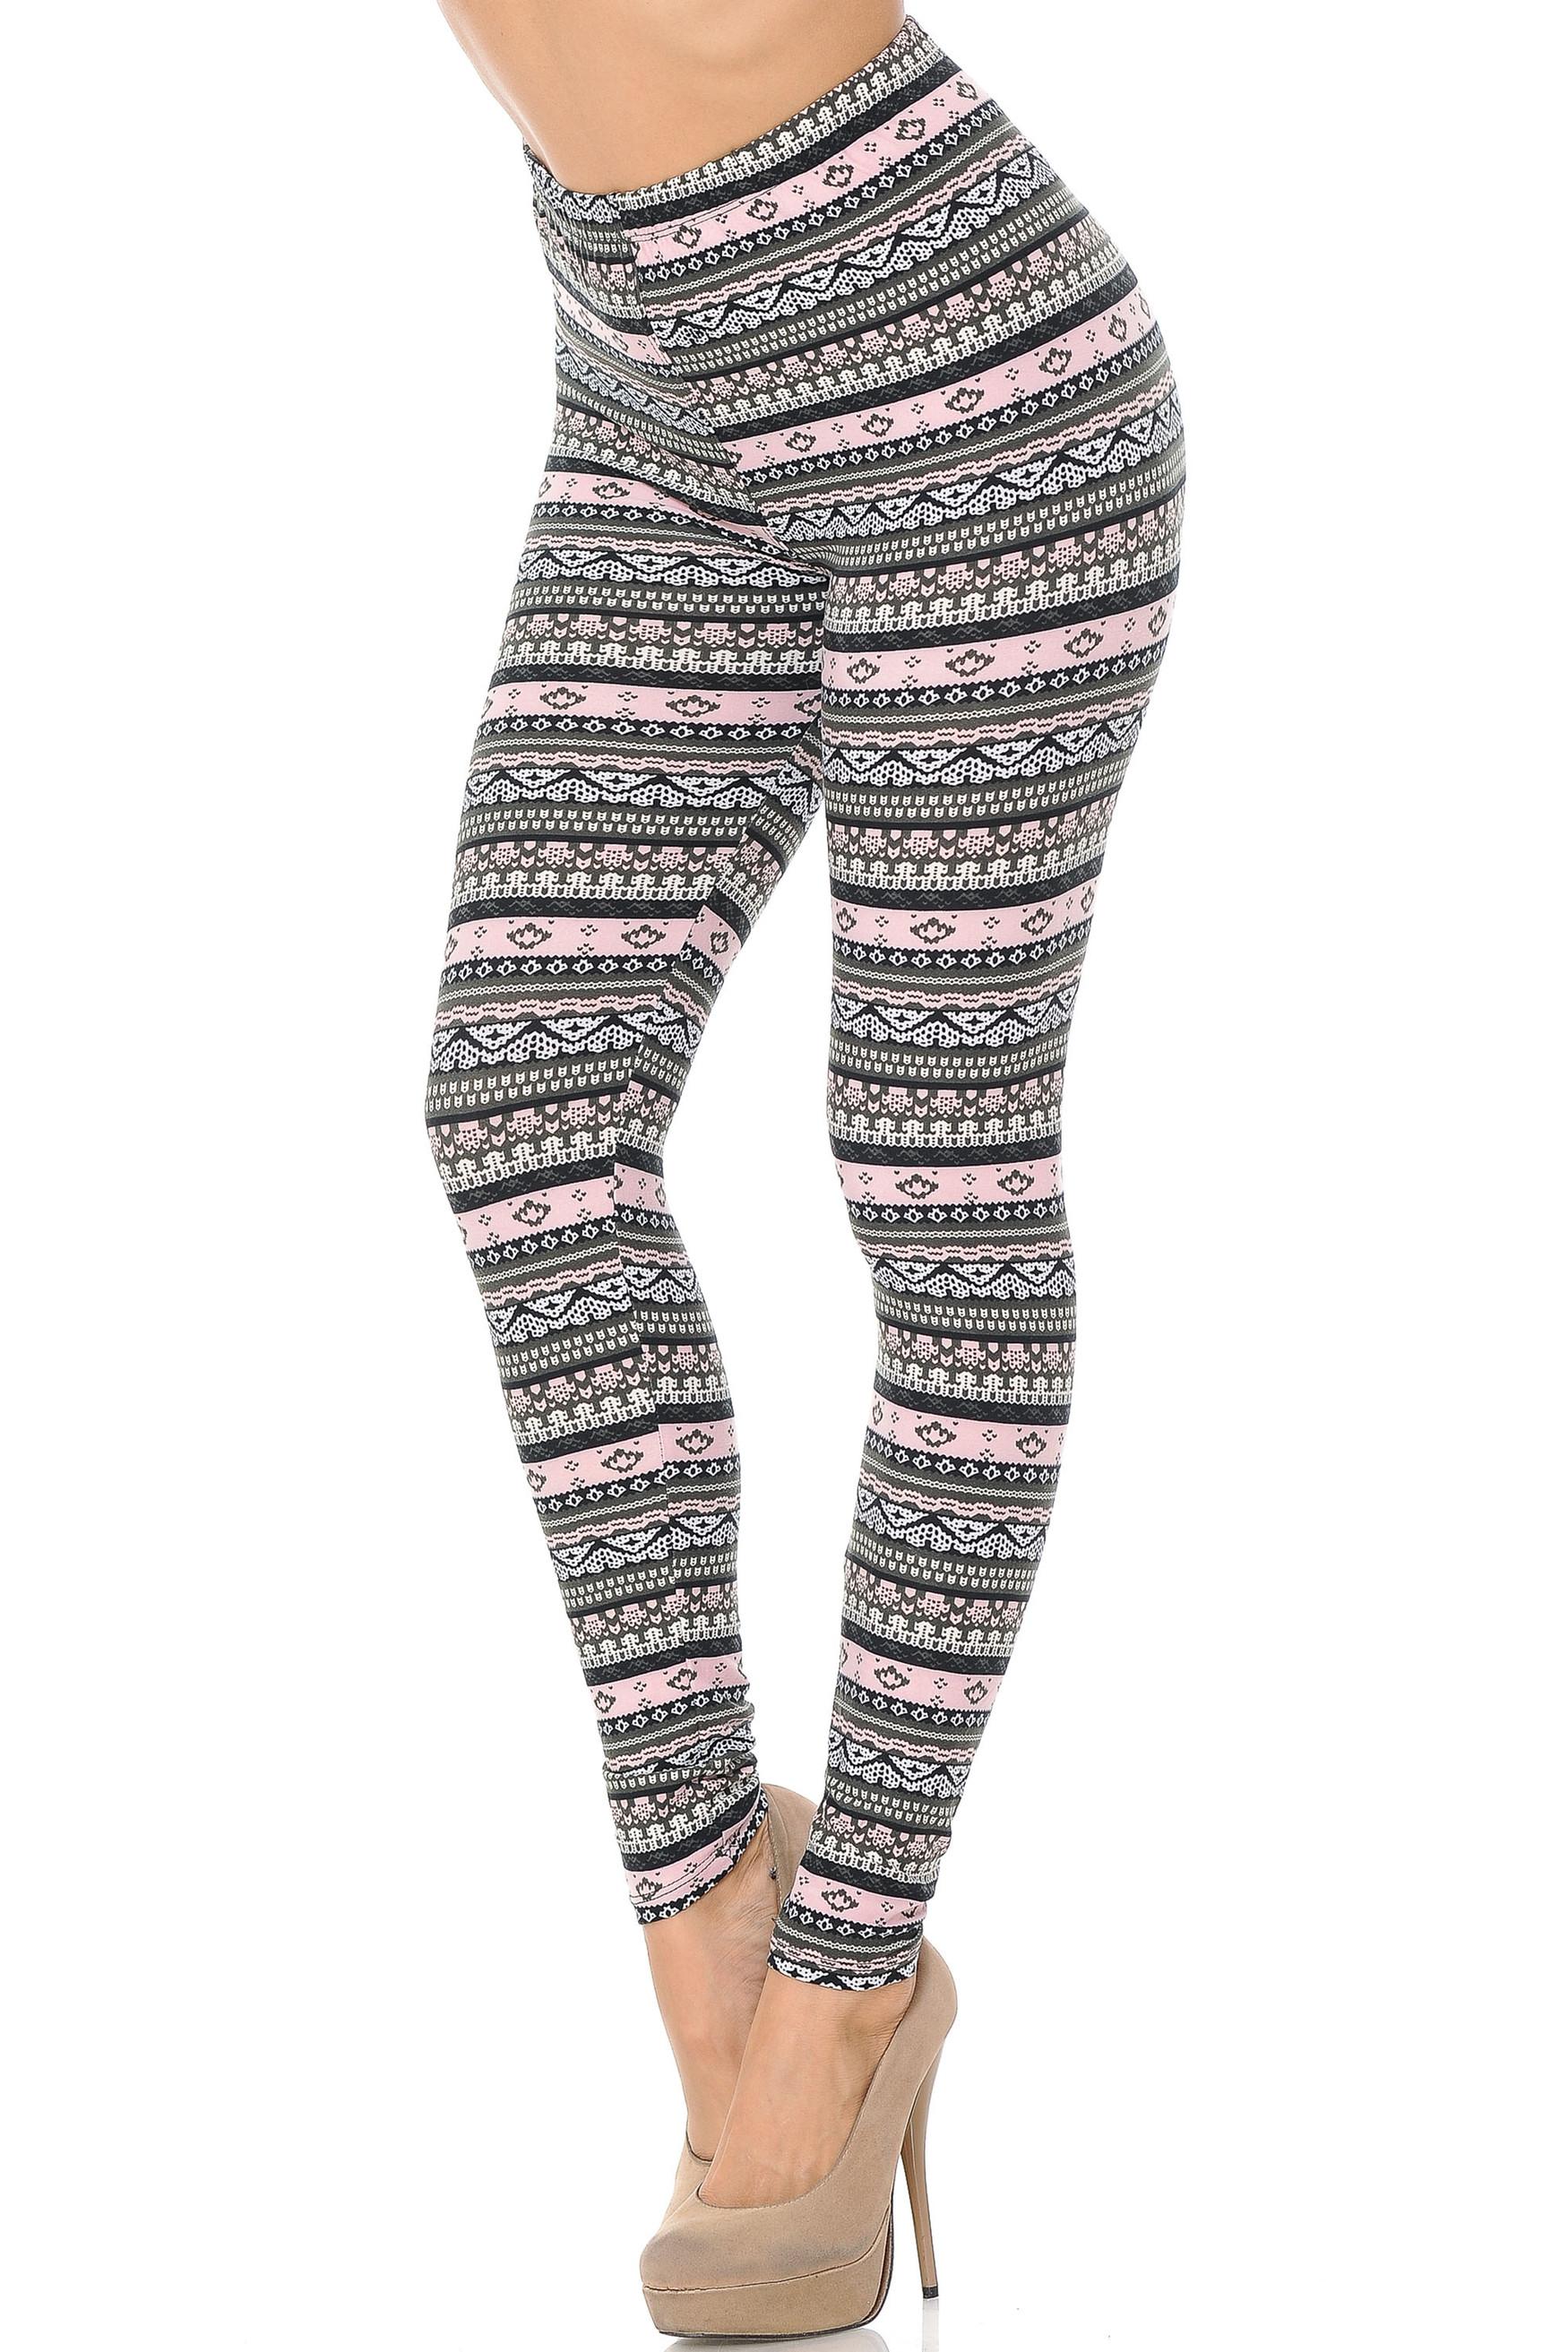 Brushed Dainty Pink Wrap Plus Size Leggings